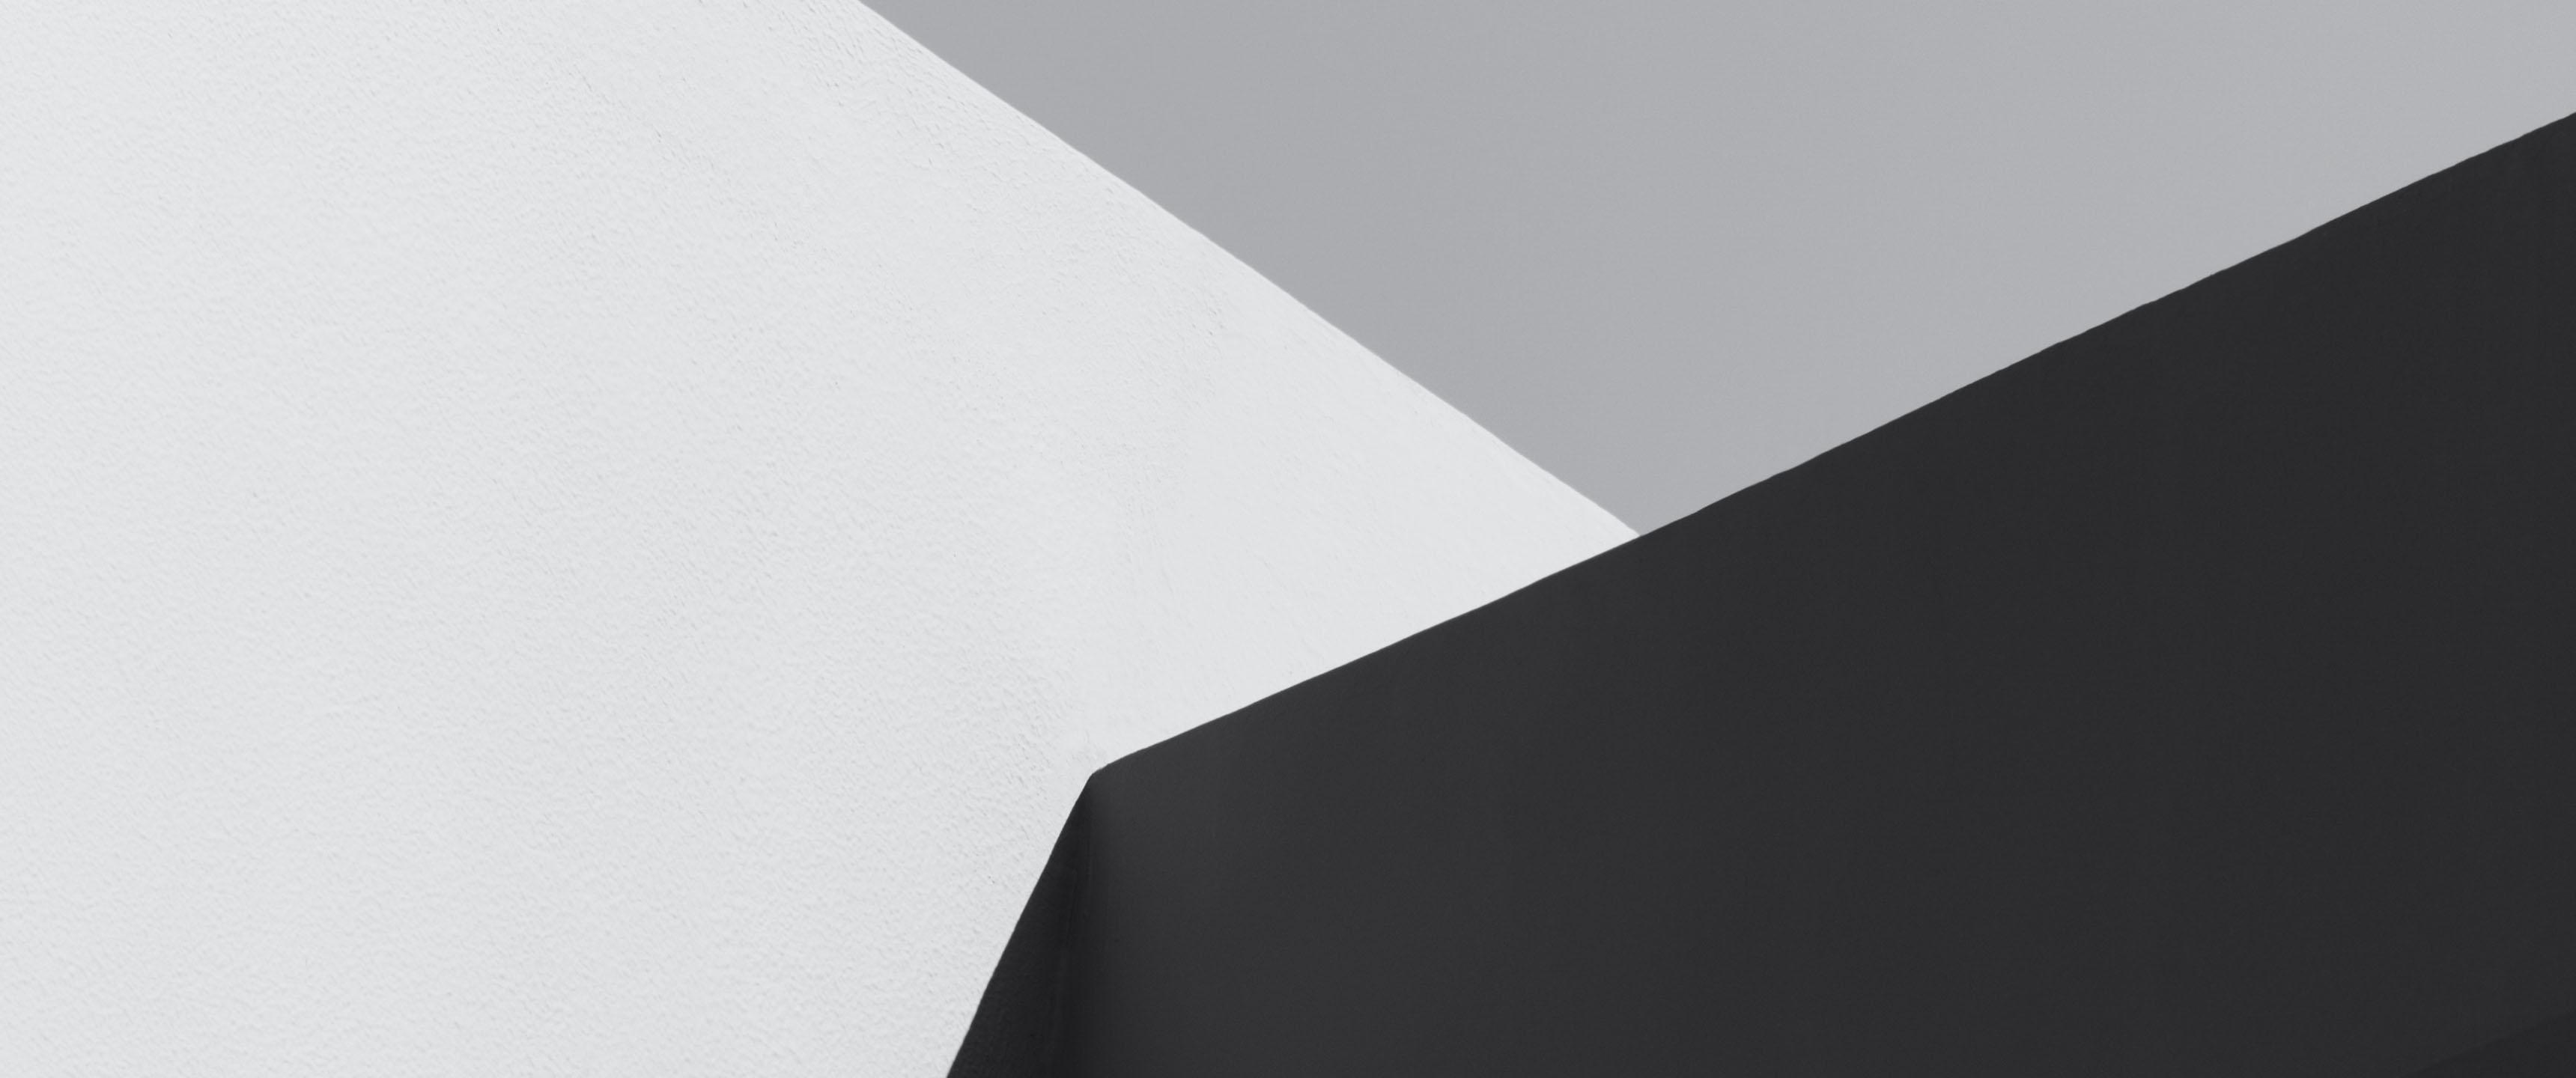 Colorblock 21 9 Wallpaper Ultrawide Monitor 21 9 Wallpapers